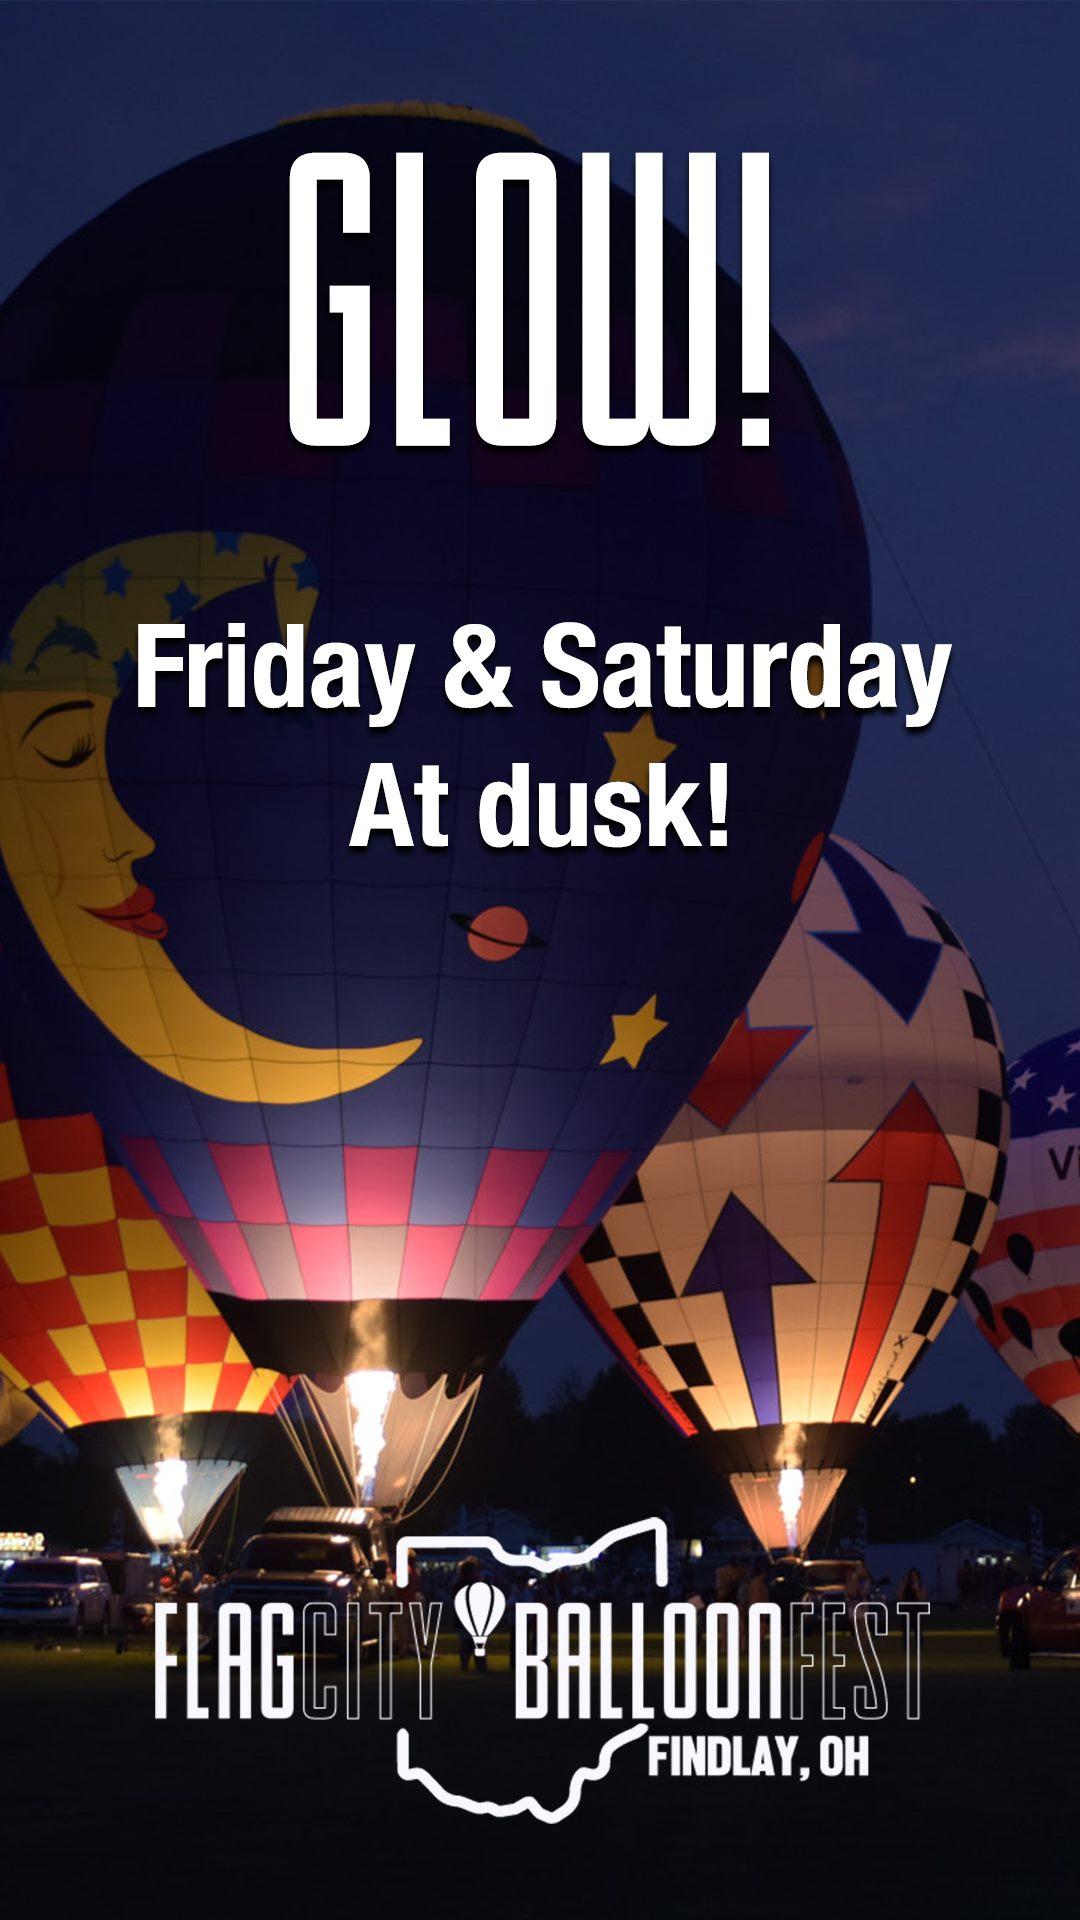 BalloonFest Glow Ad